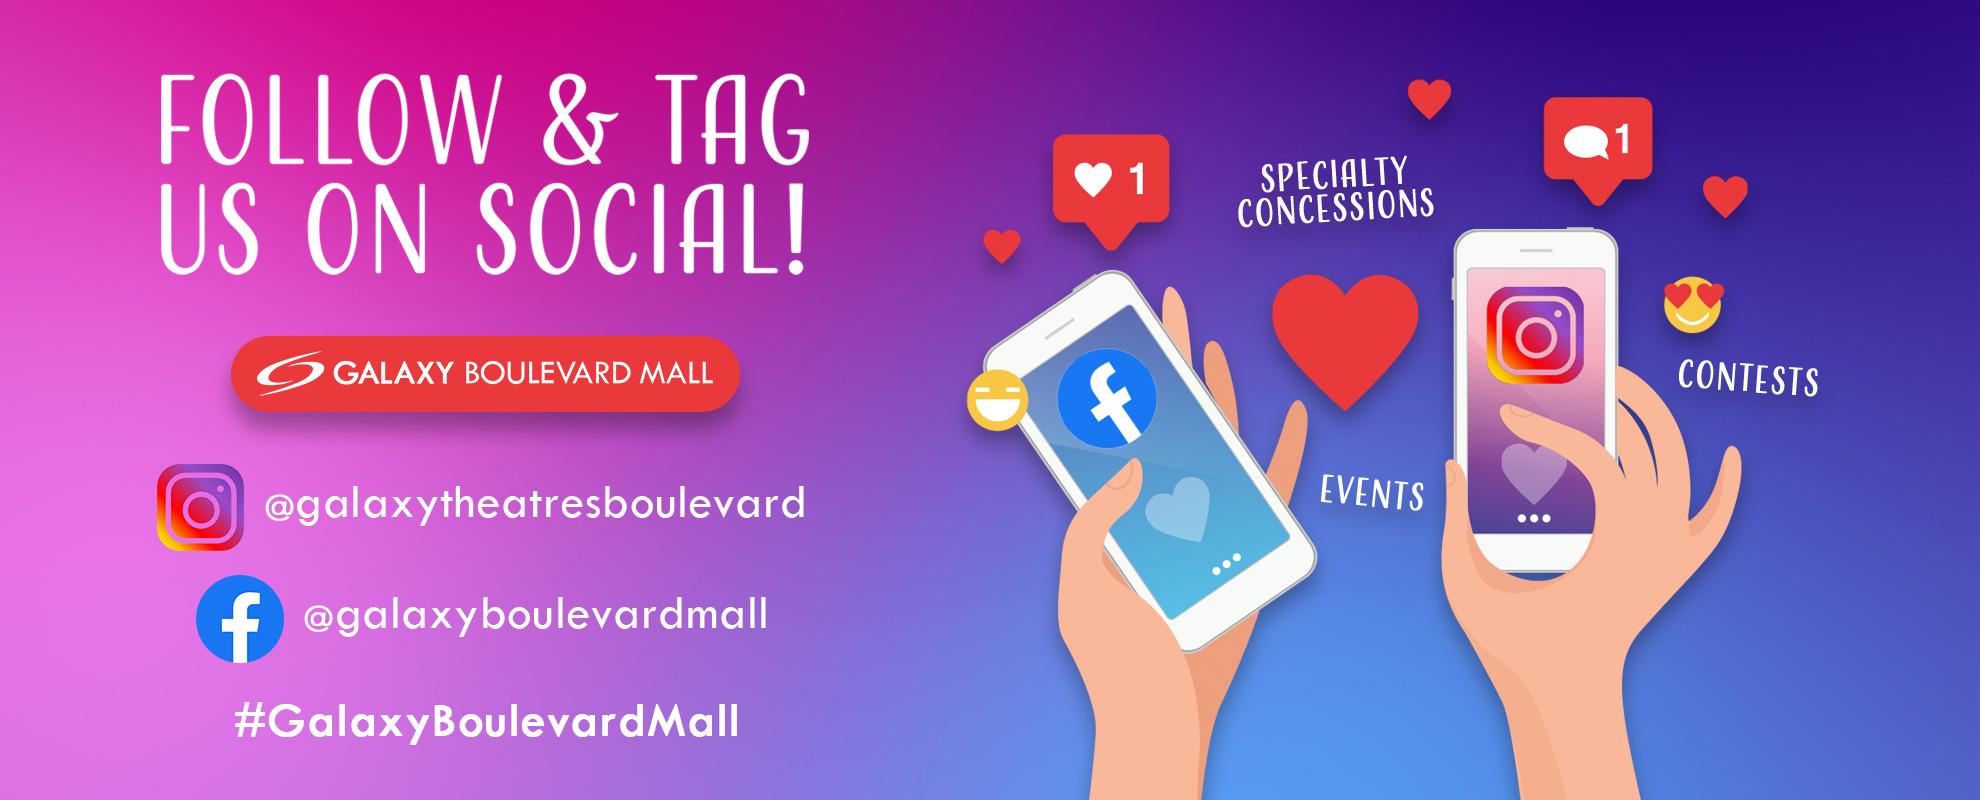 Socials/Hashtag - Boulevard image